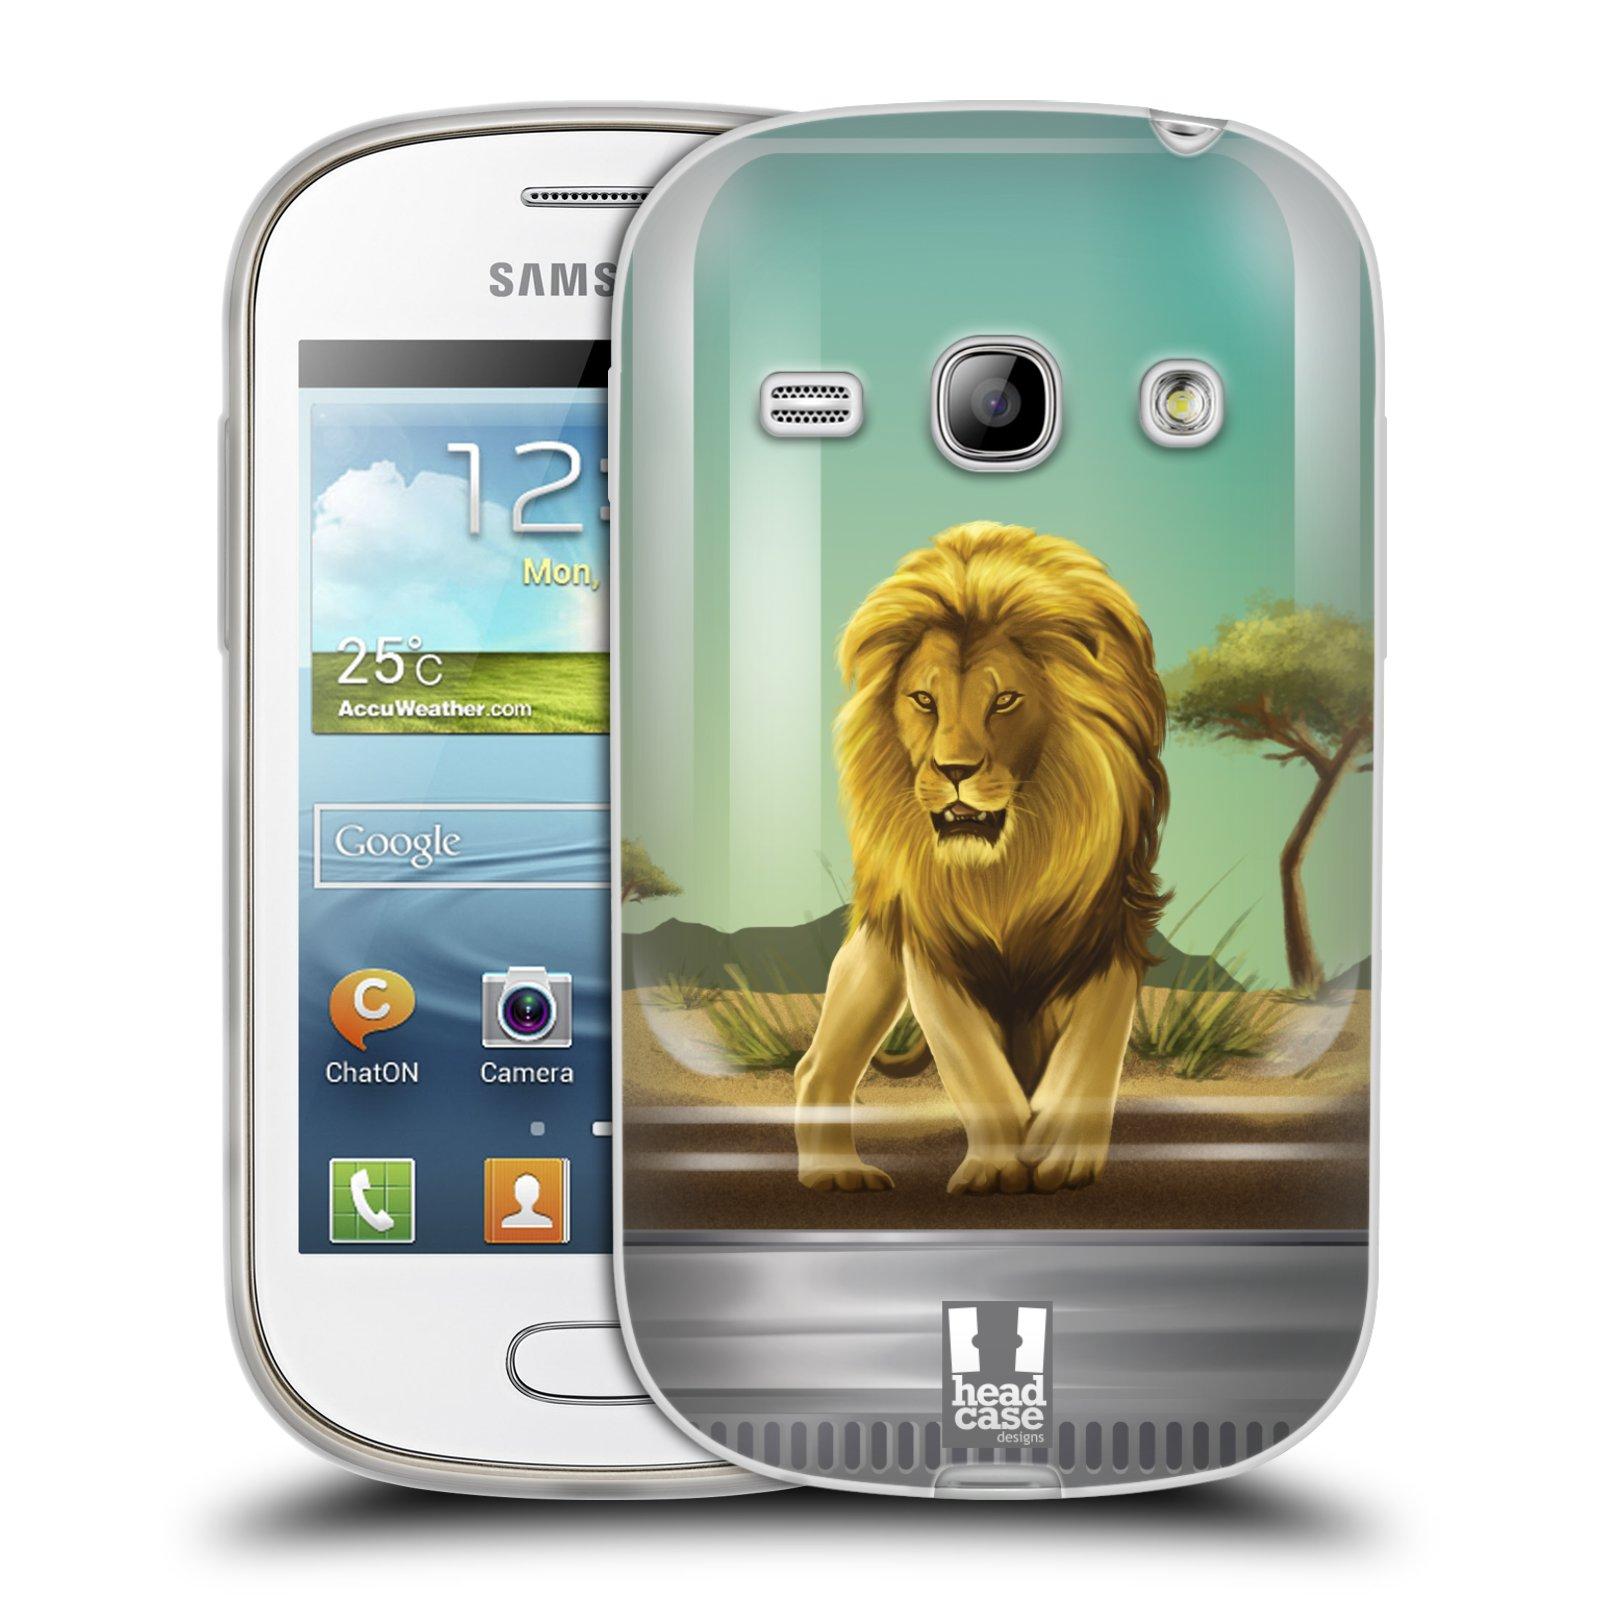 HEAD CASE silikonový obal na mobil Samsung Galaxy FAME vzor Zvířátka v těžítku lev